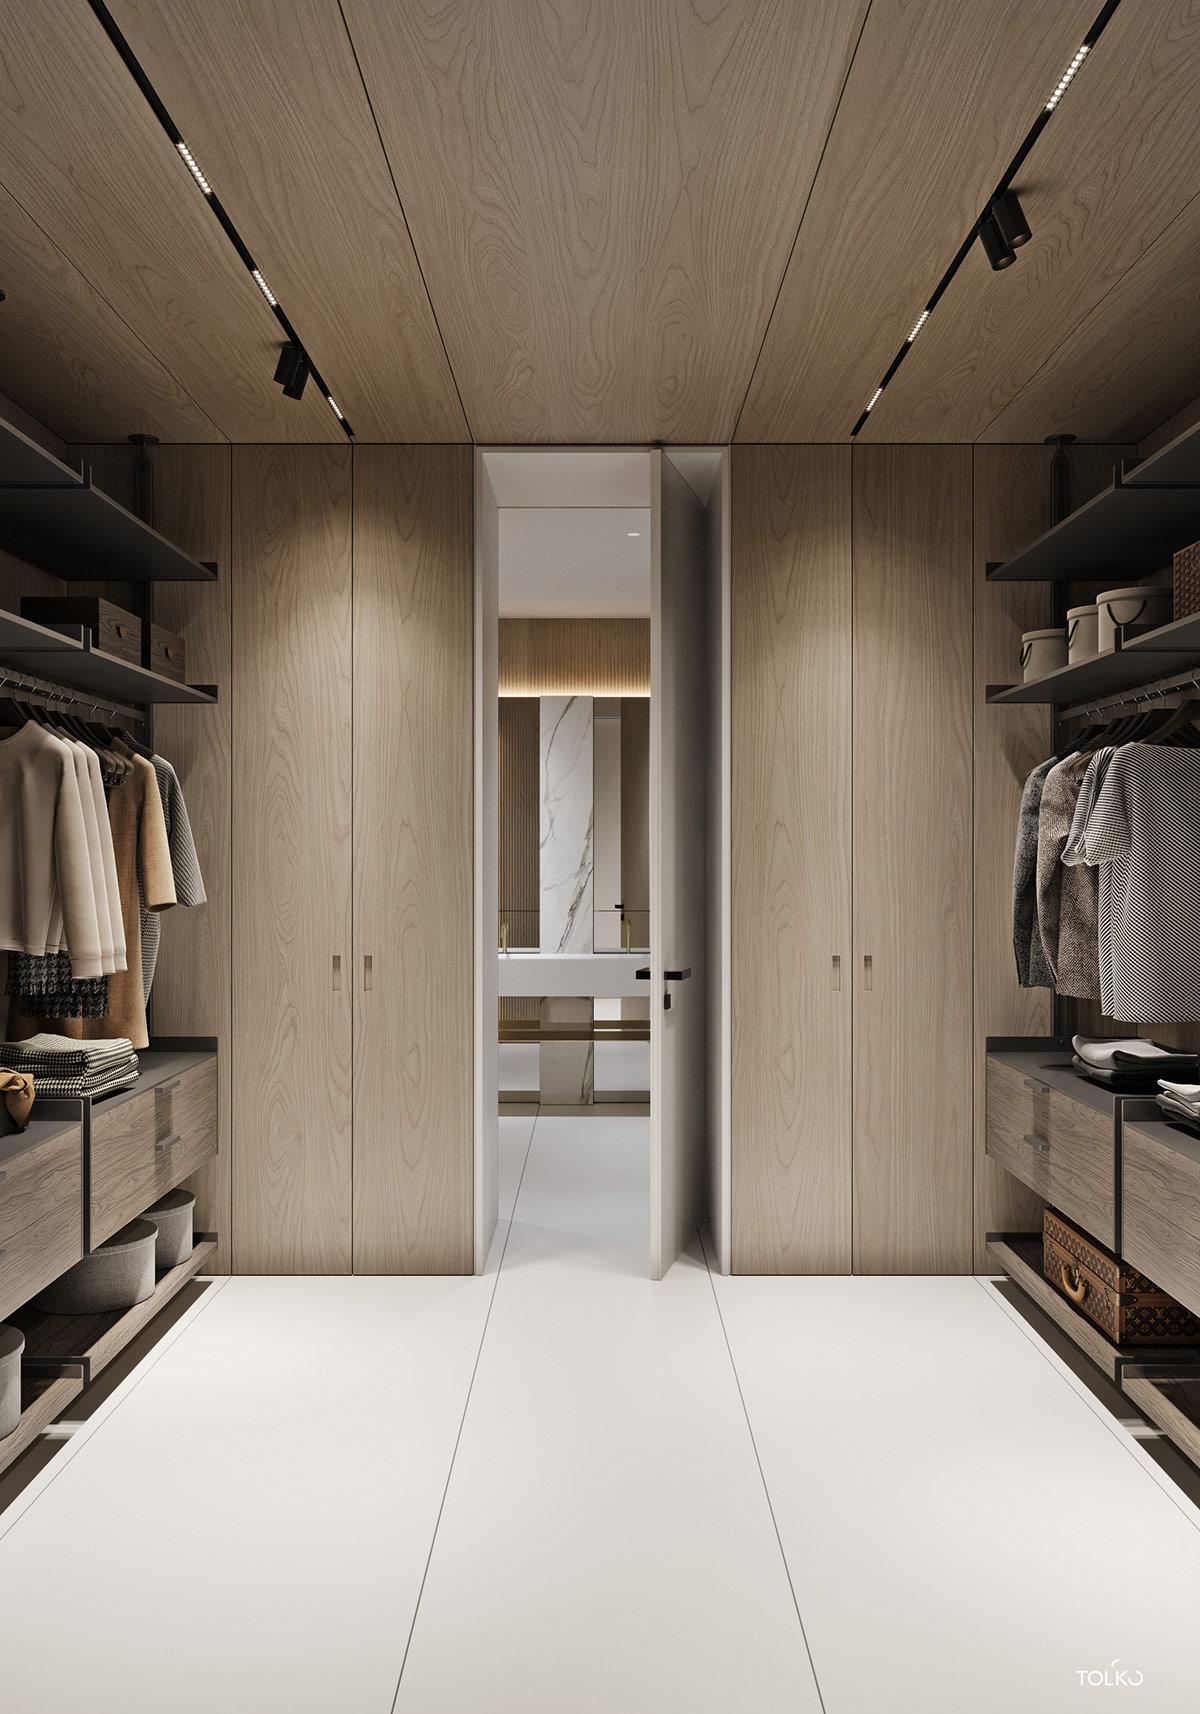 walk-in-wardrobe-2-600x857.jpg